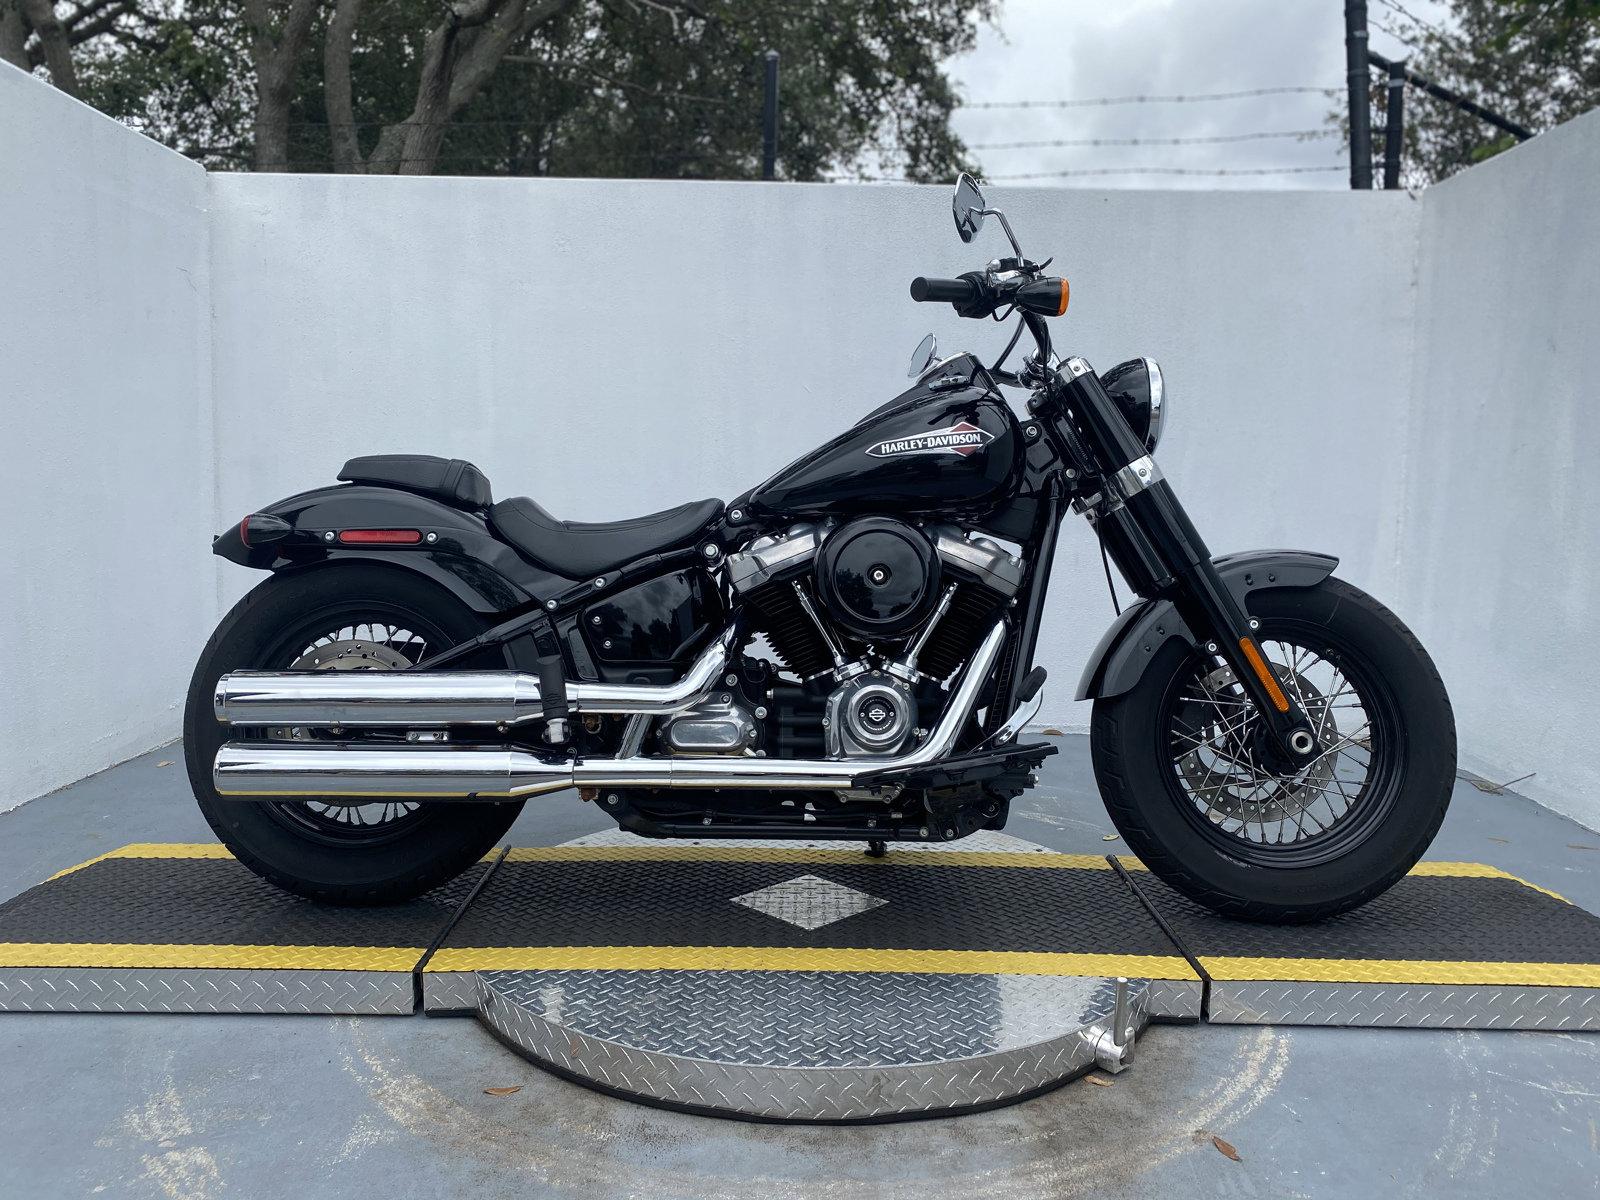 Pre-Owned 2019 Harley-Davidson Softail Slim FLSL